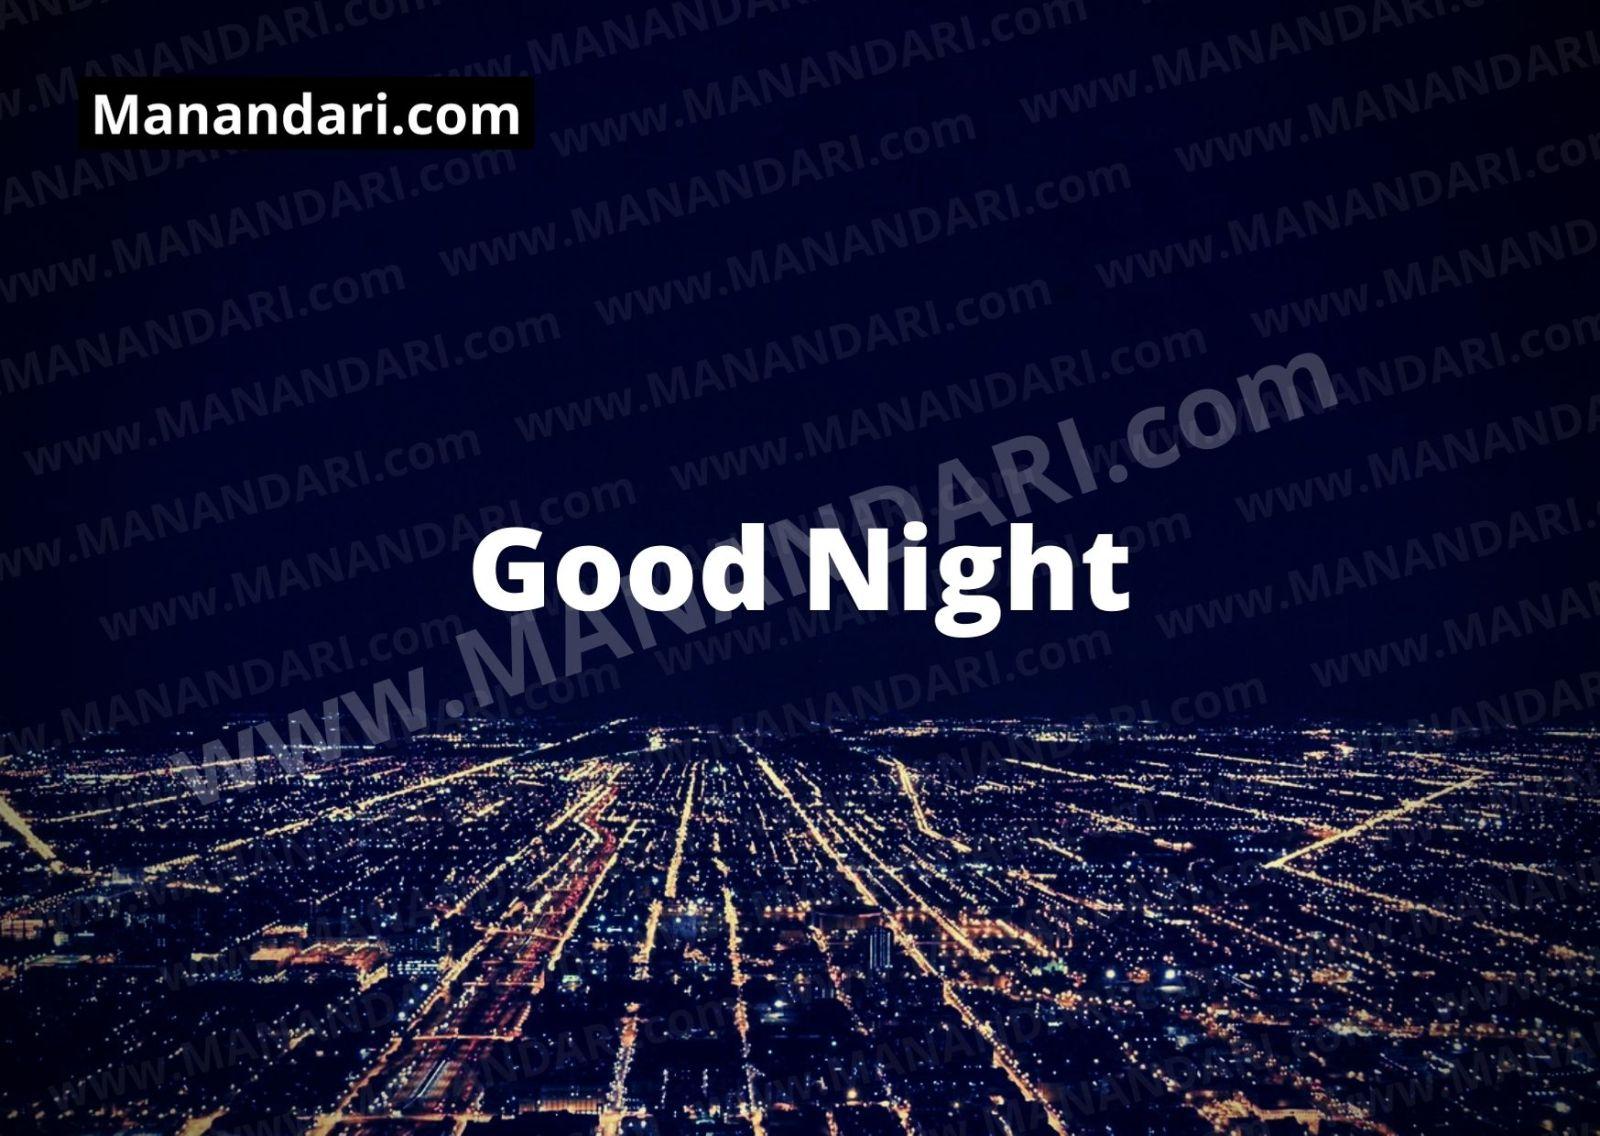 Good Night - 5